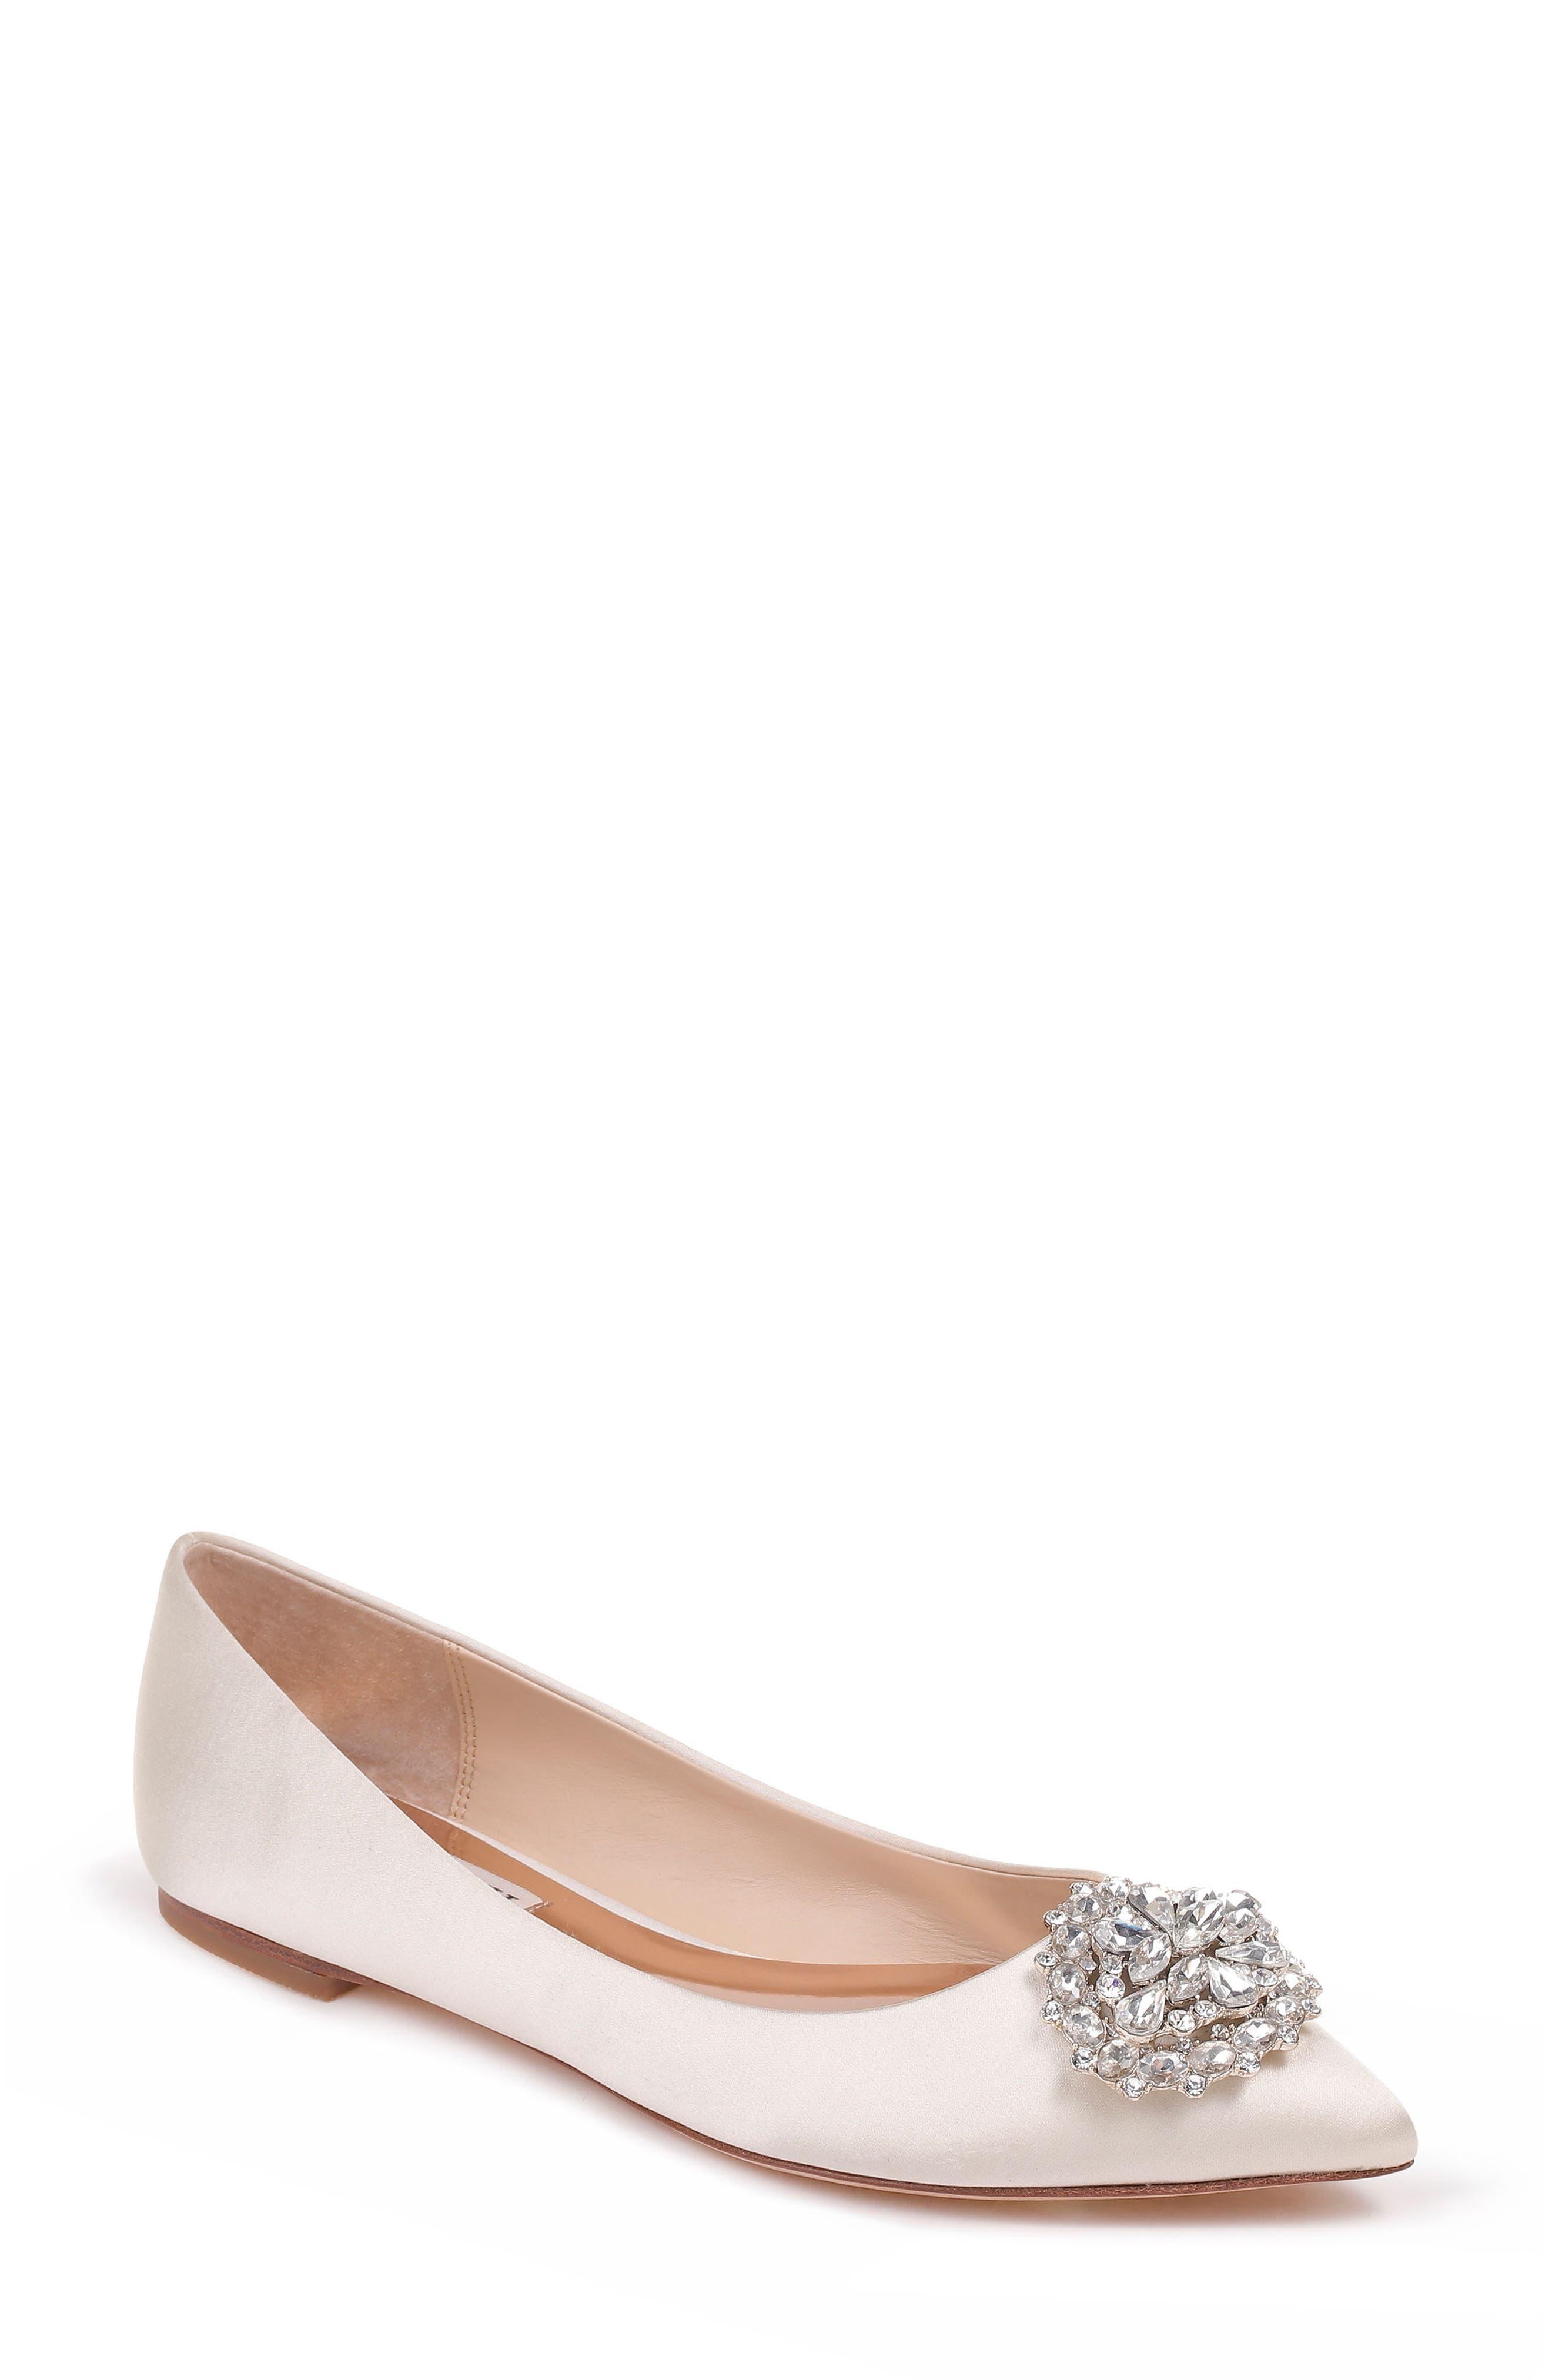 'Davis' Crystal Embellished Pointy Toe Flat,                         Main,                         color, Ivory Satin